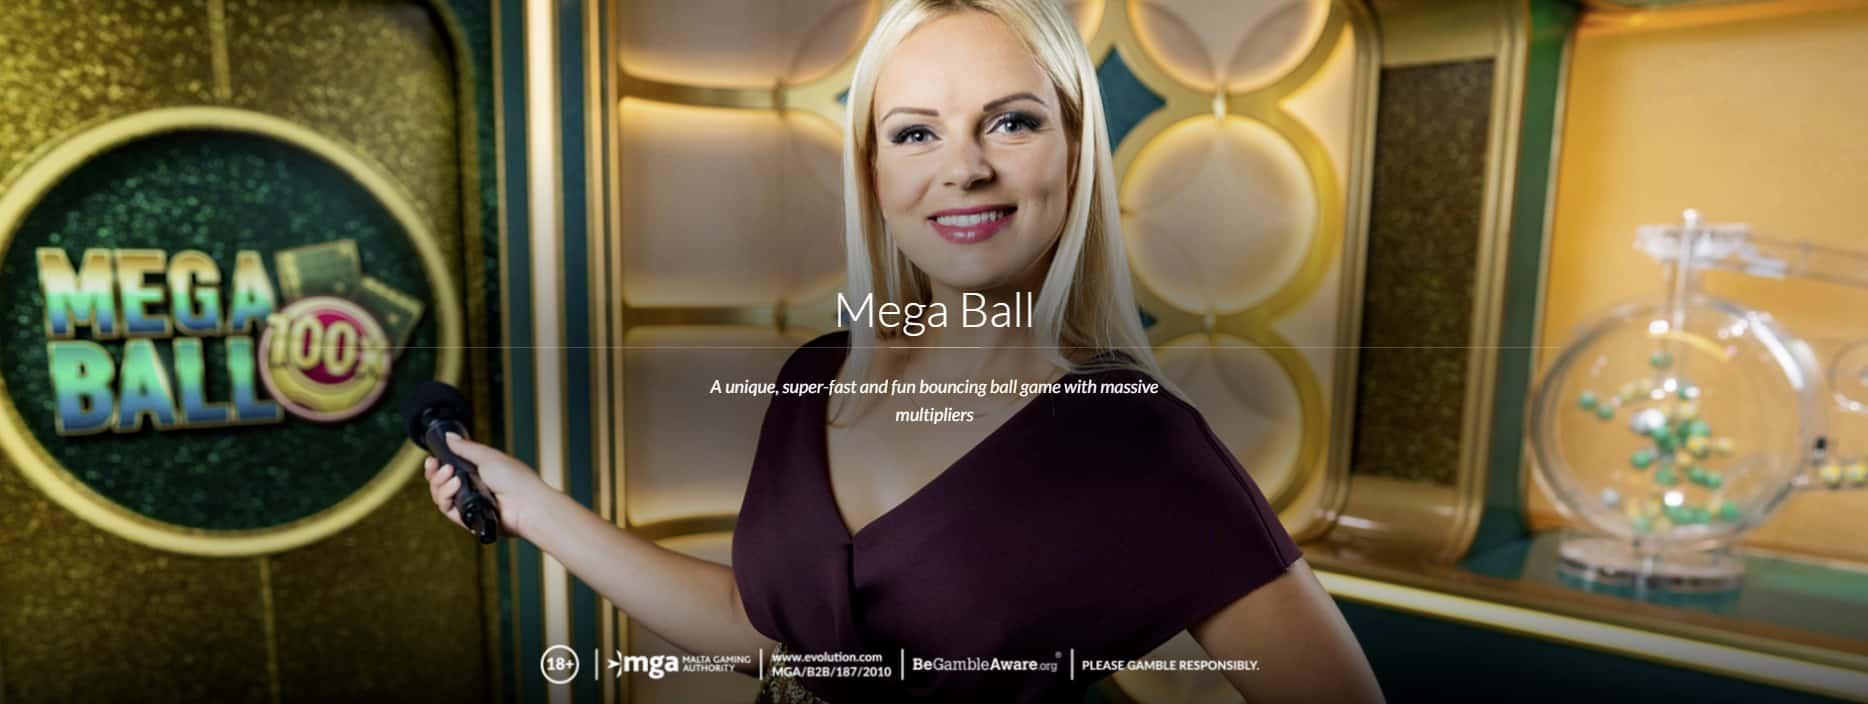 Megaball Play Now